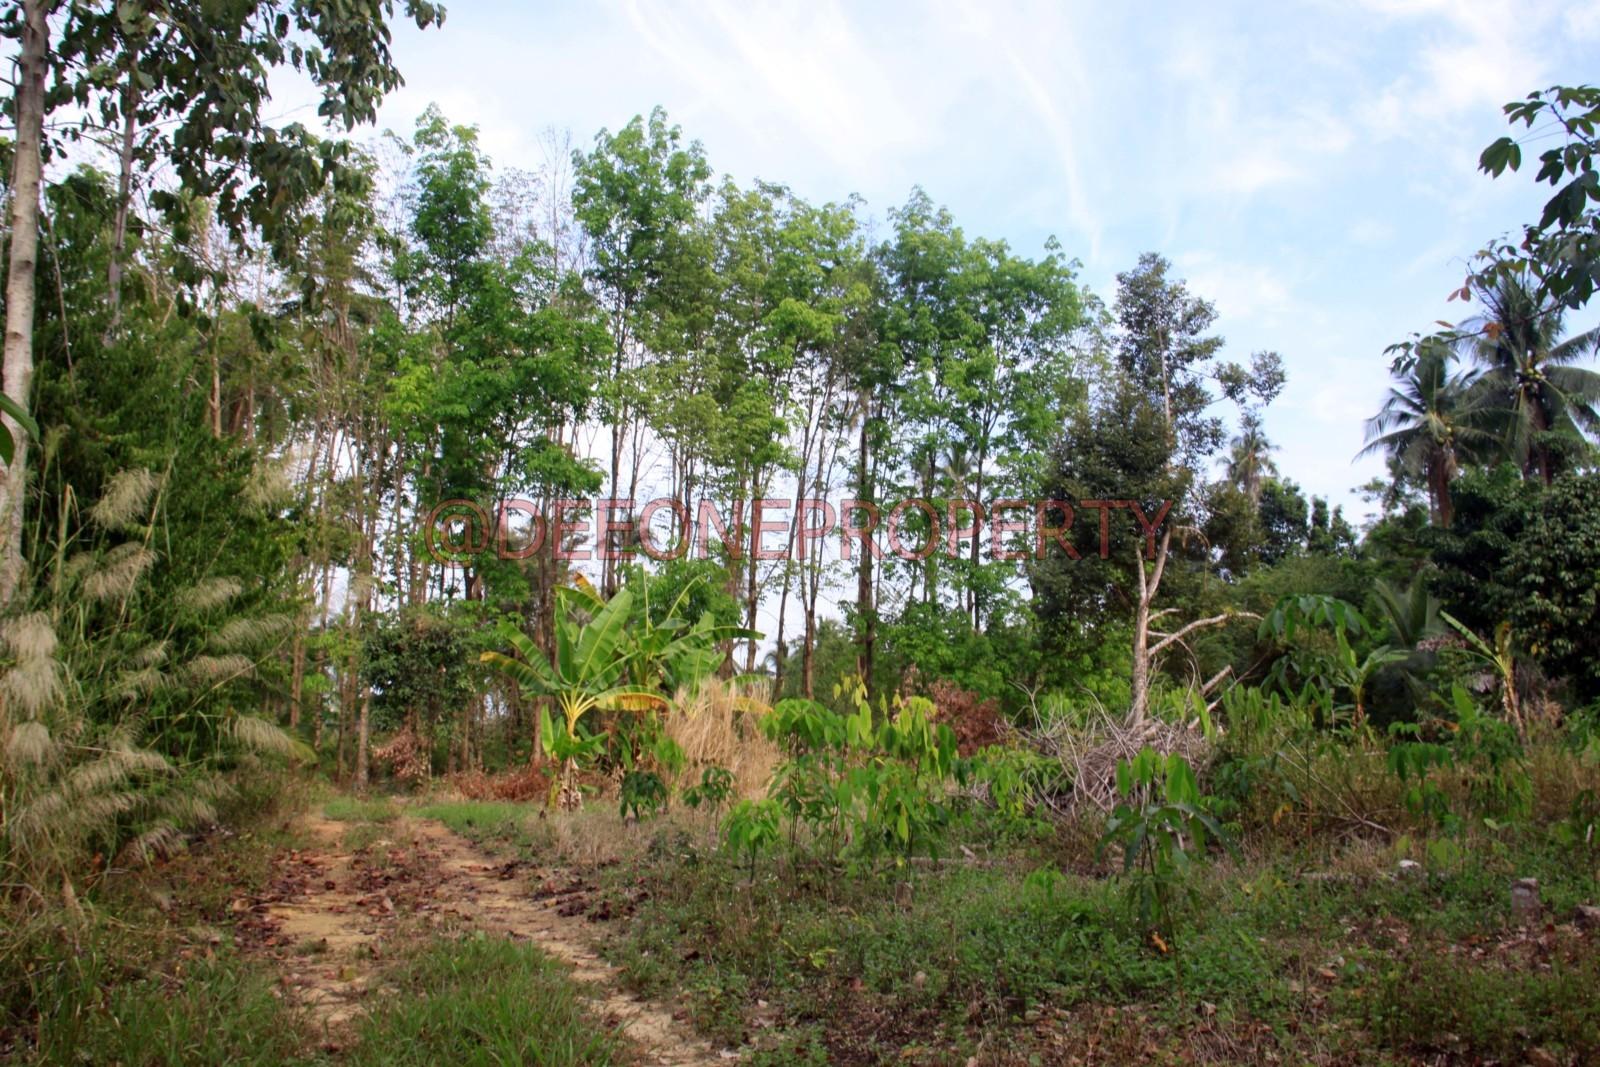 5 Rai Flat Land for Sale – Dan Mai, Koh Chang